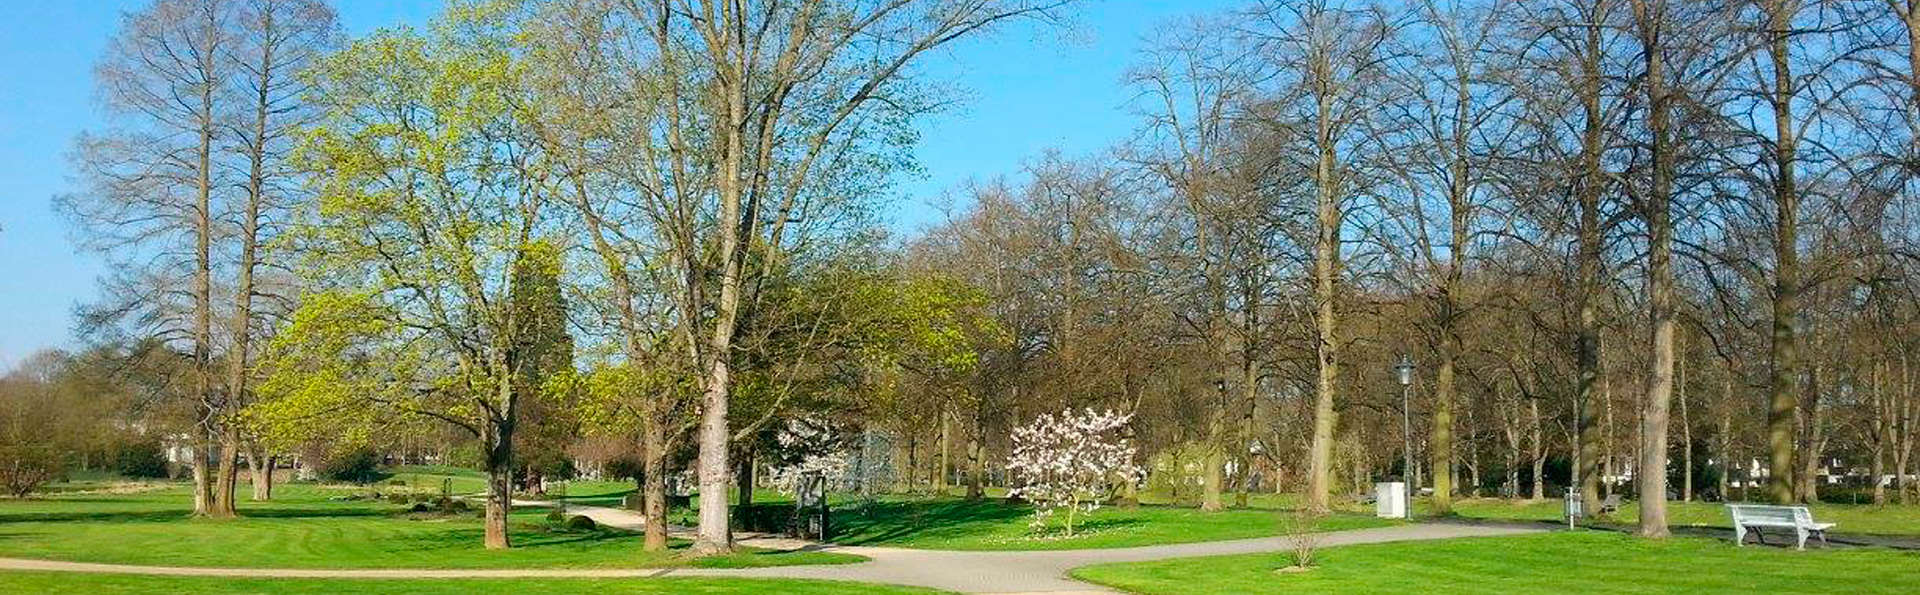 Dorint Parkhotel Bad Neuenahr - edit_park11.jpg